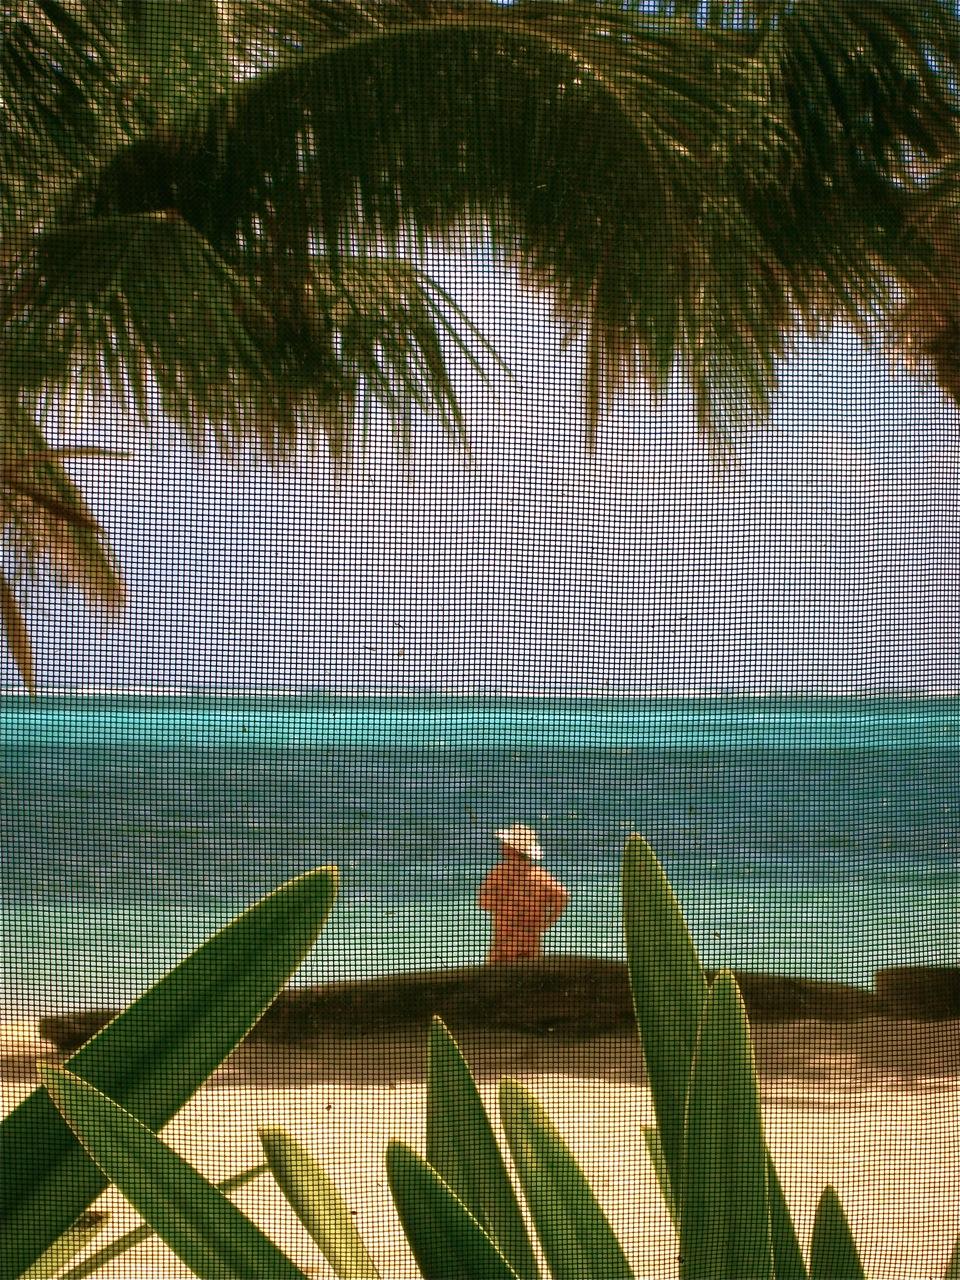 A view of the Caye Caulker beach through a screened window.